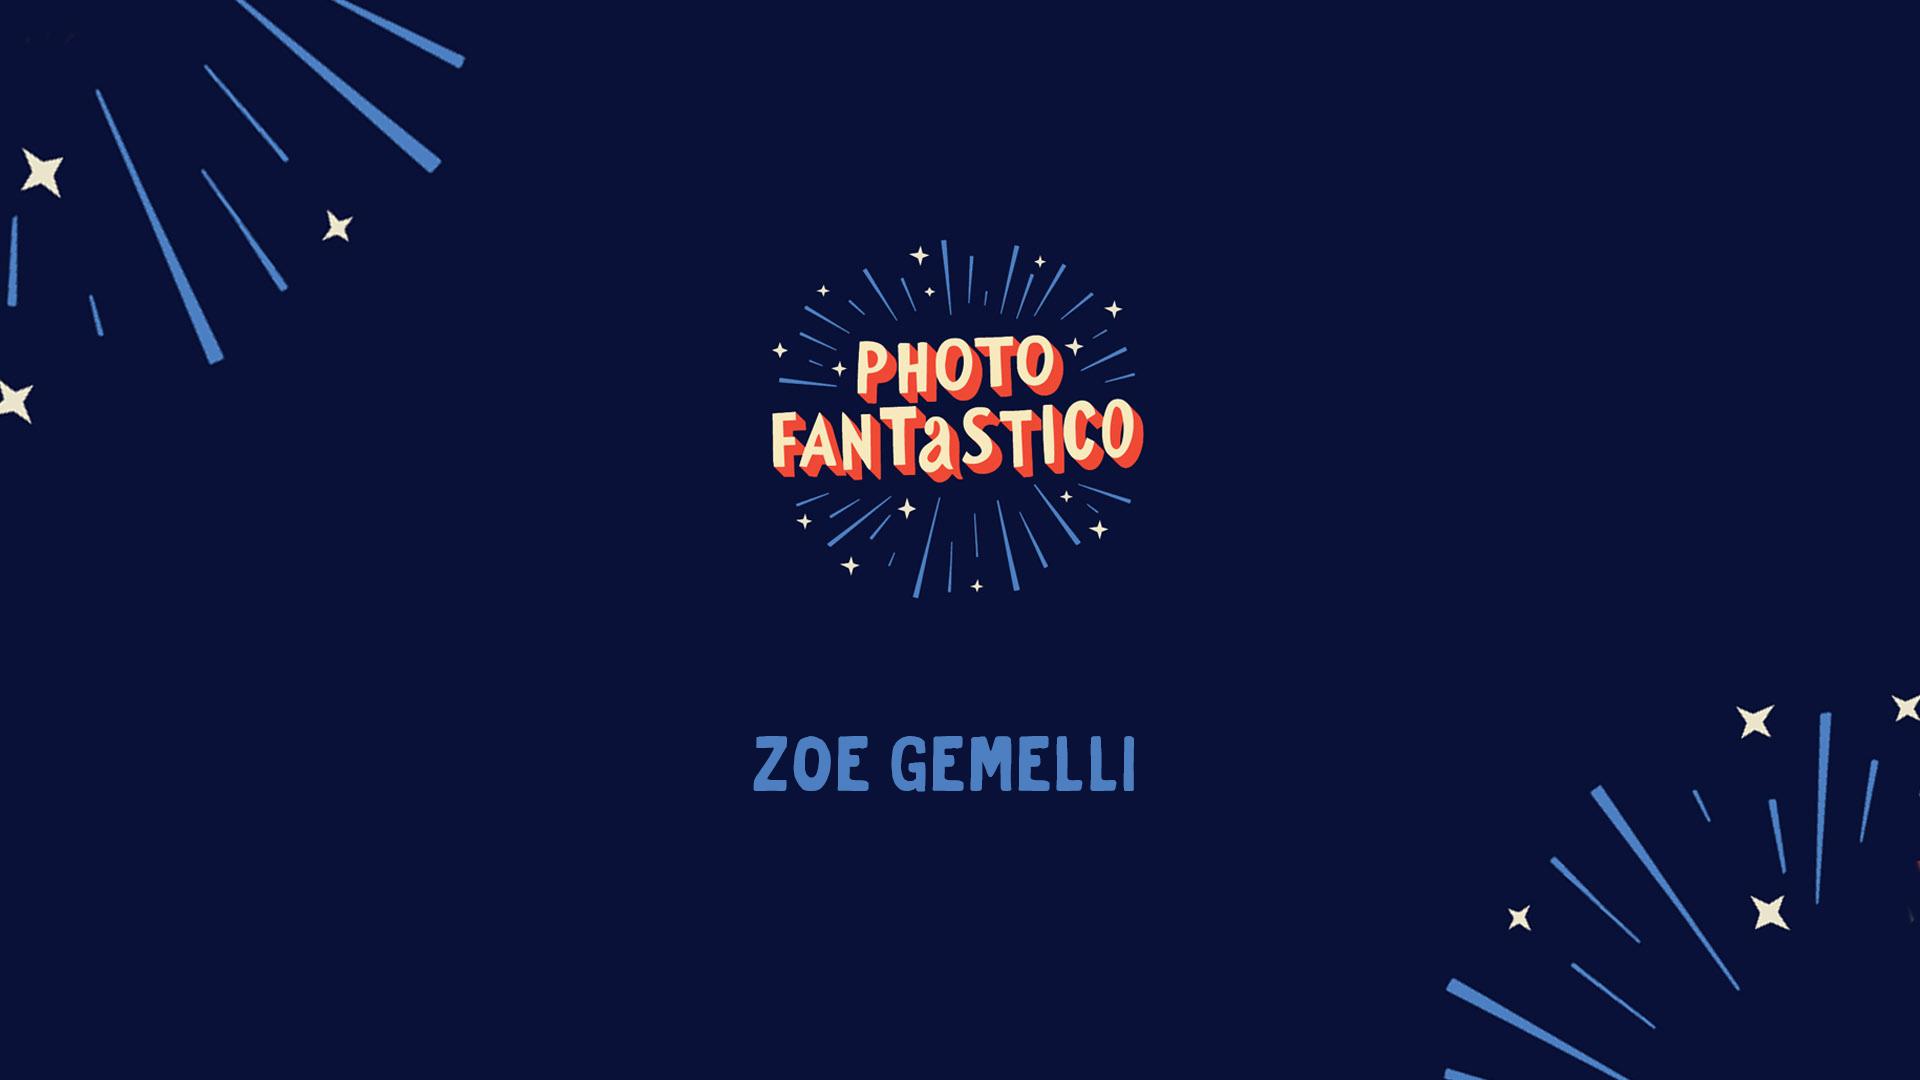 Zoe Gemelli